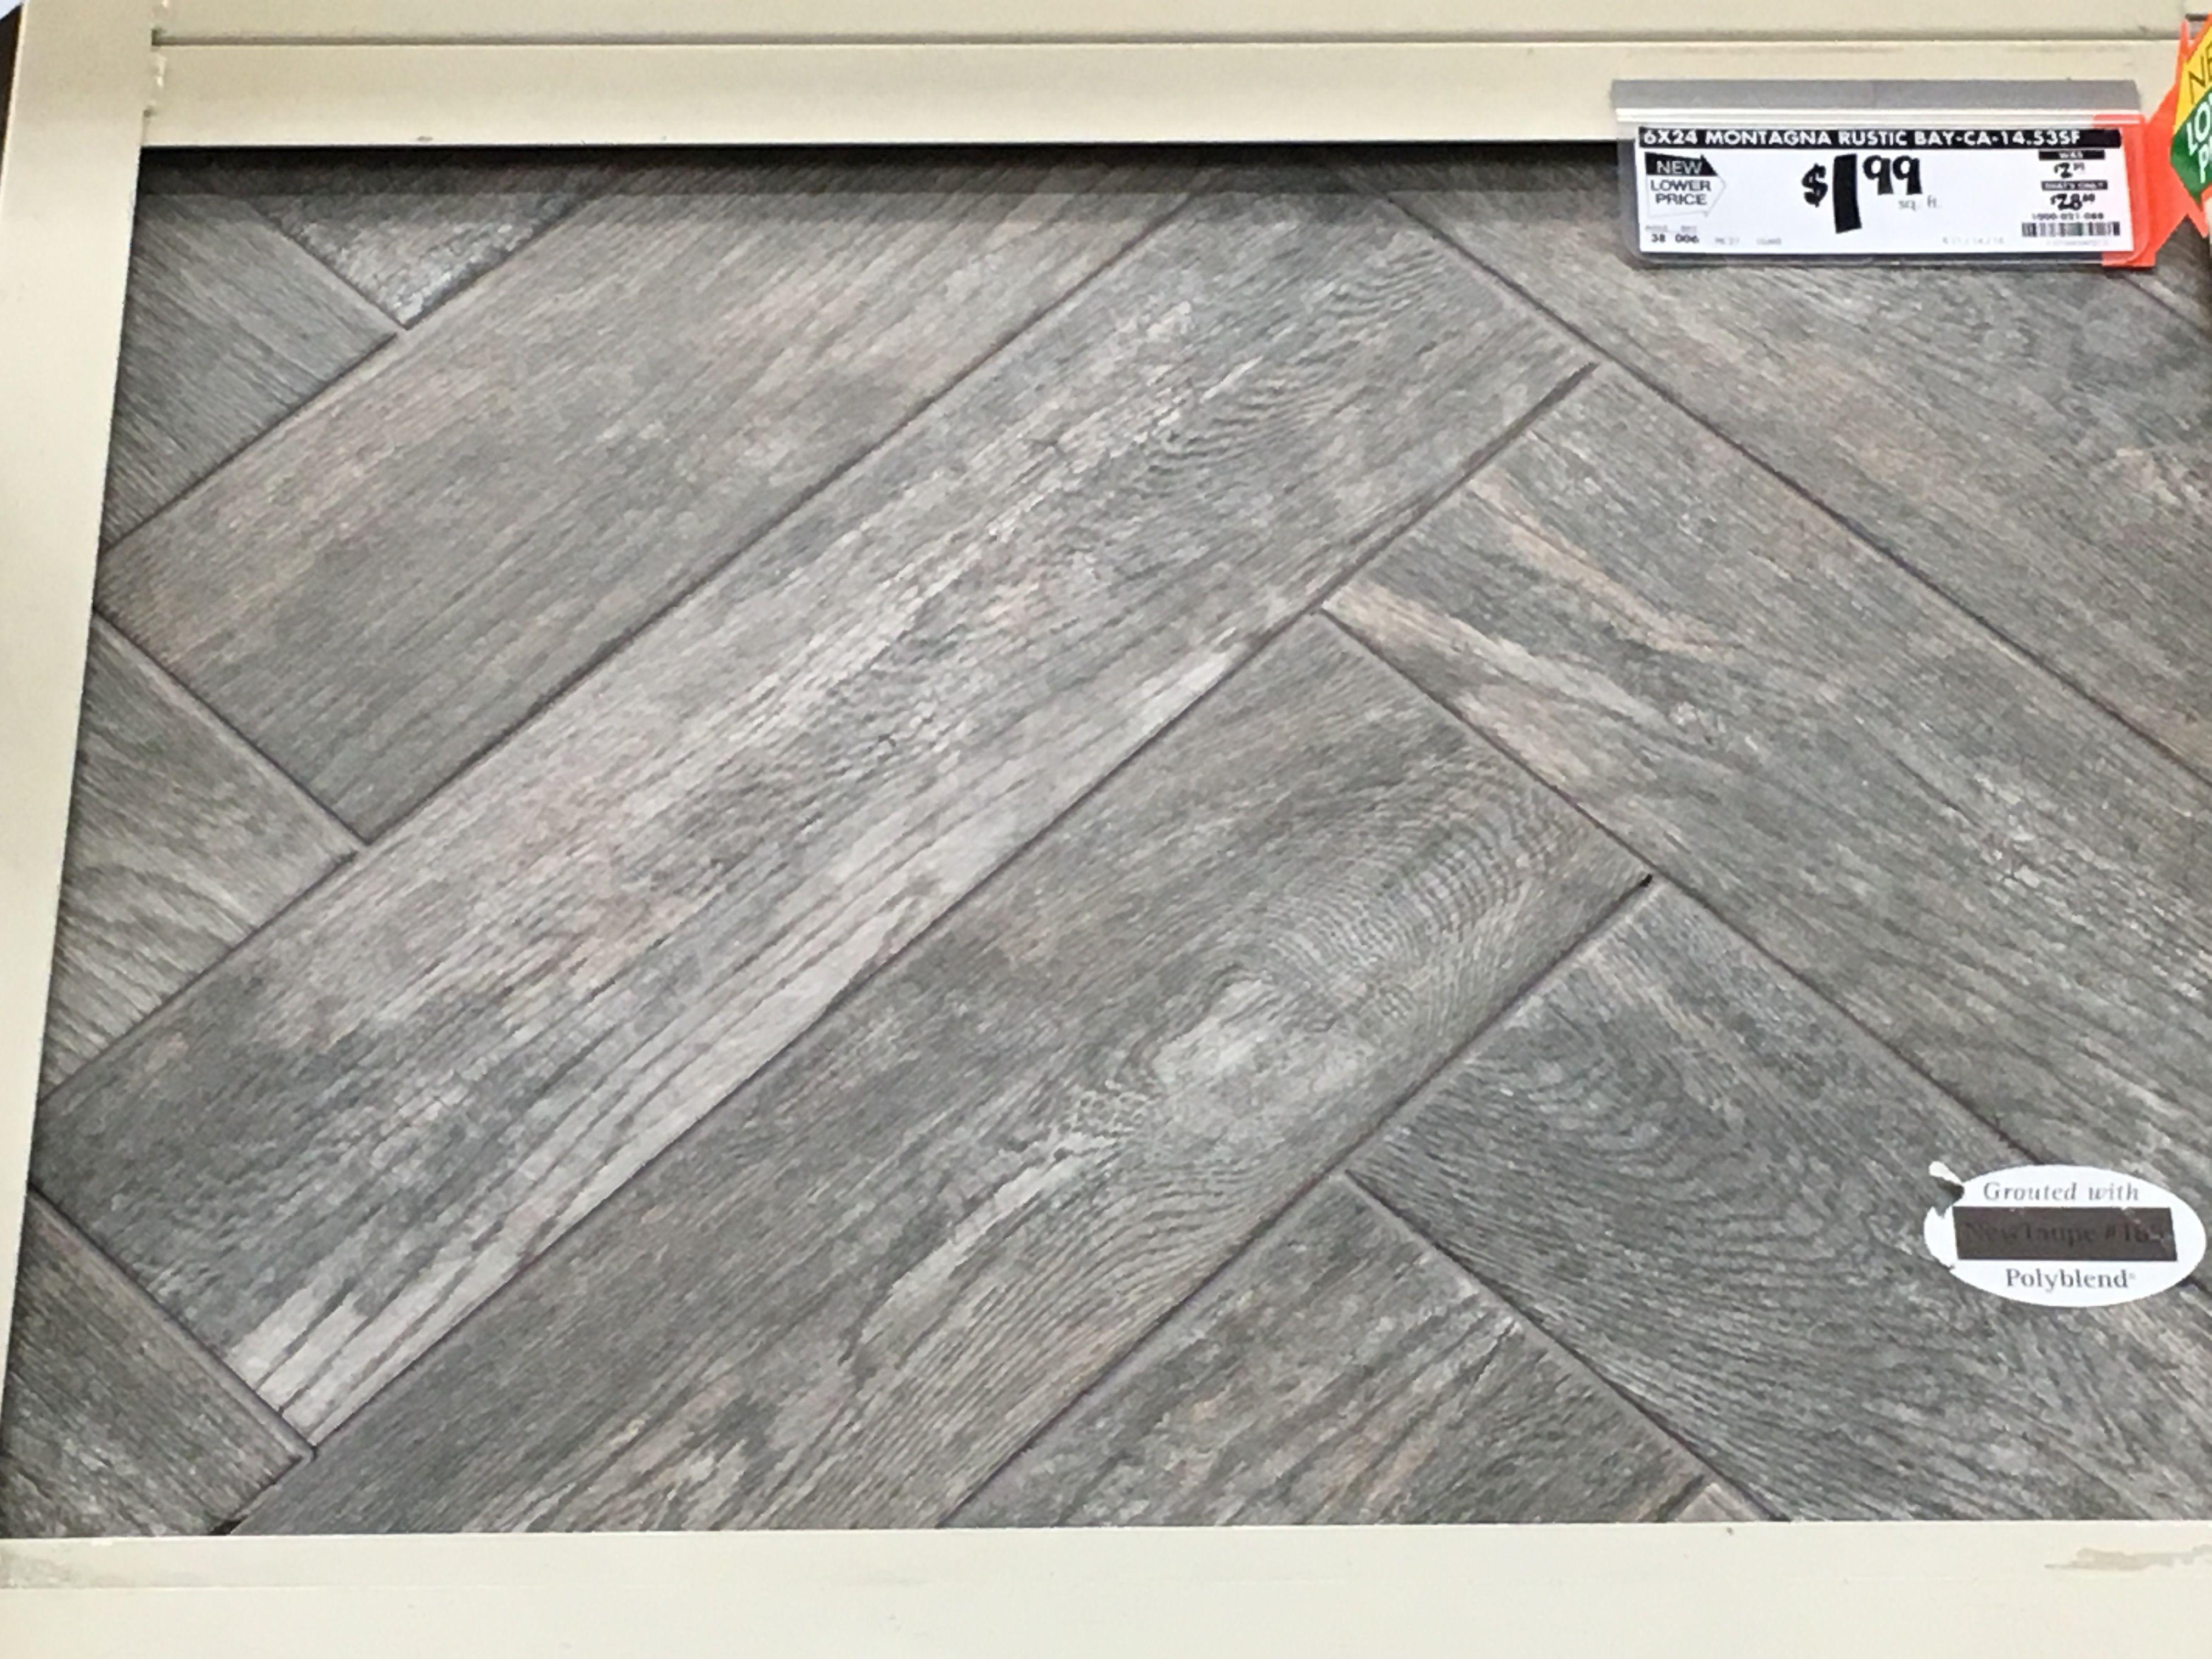 Pin by Melissa Webber on Master bedroom Flooring, Tile